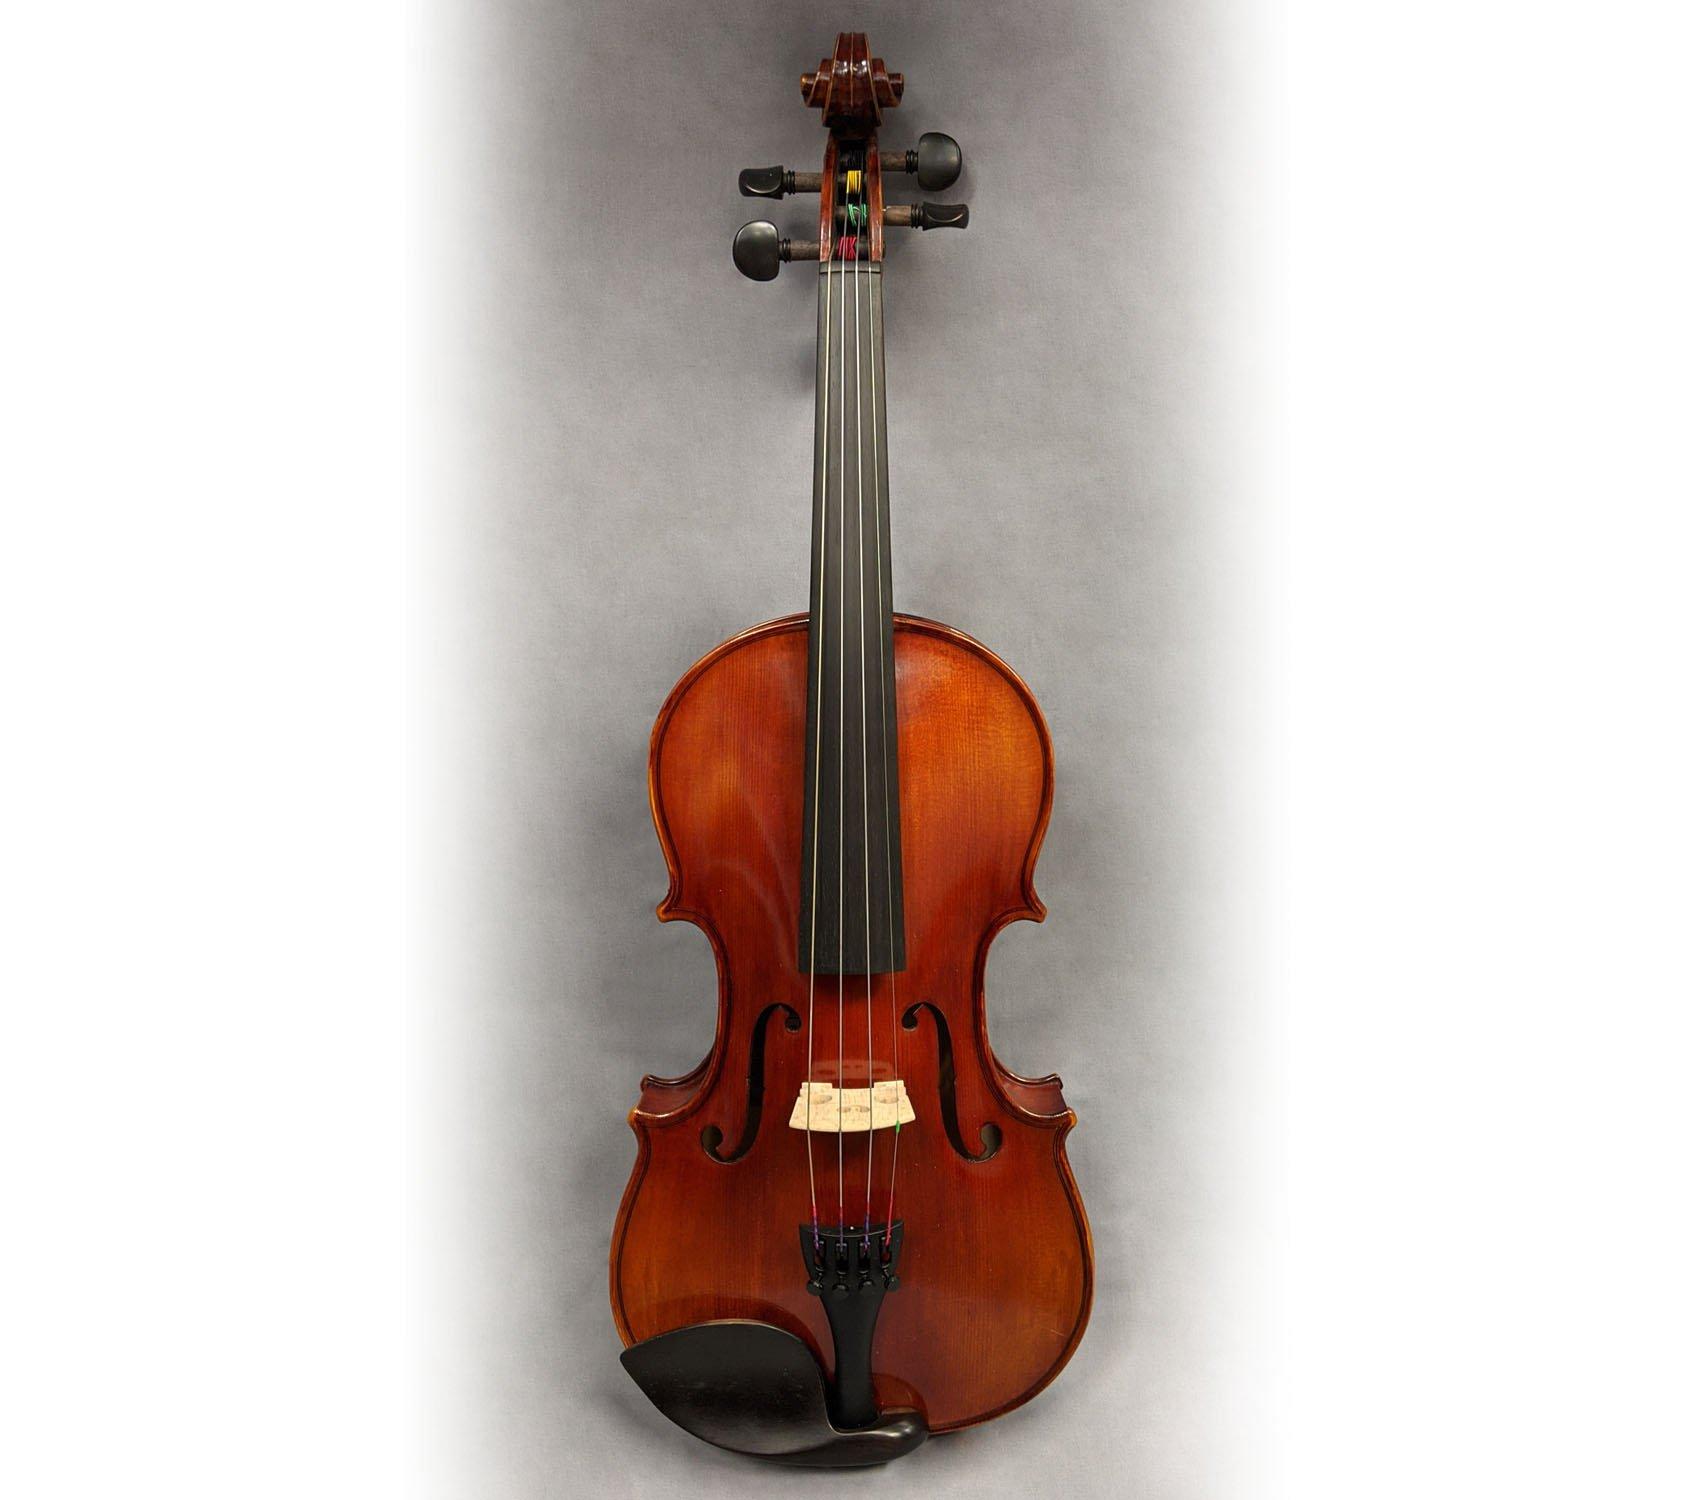 FirePhoenix FV95 4/4 Violin Outfit